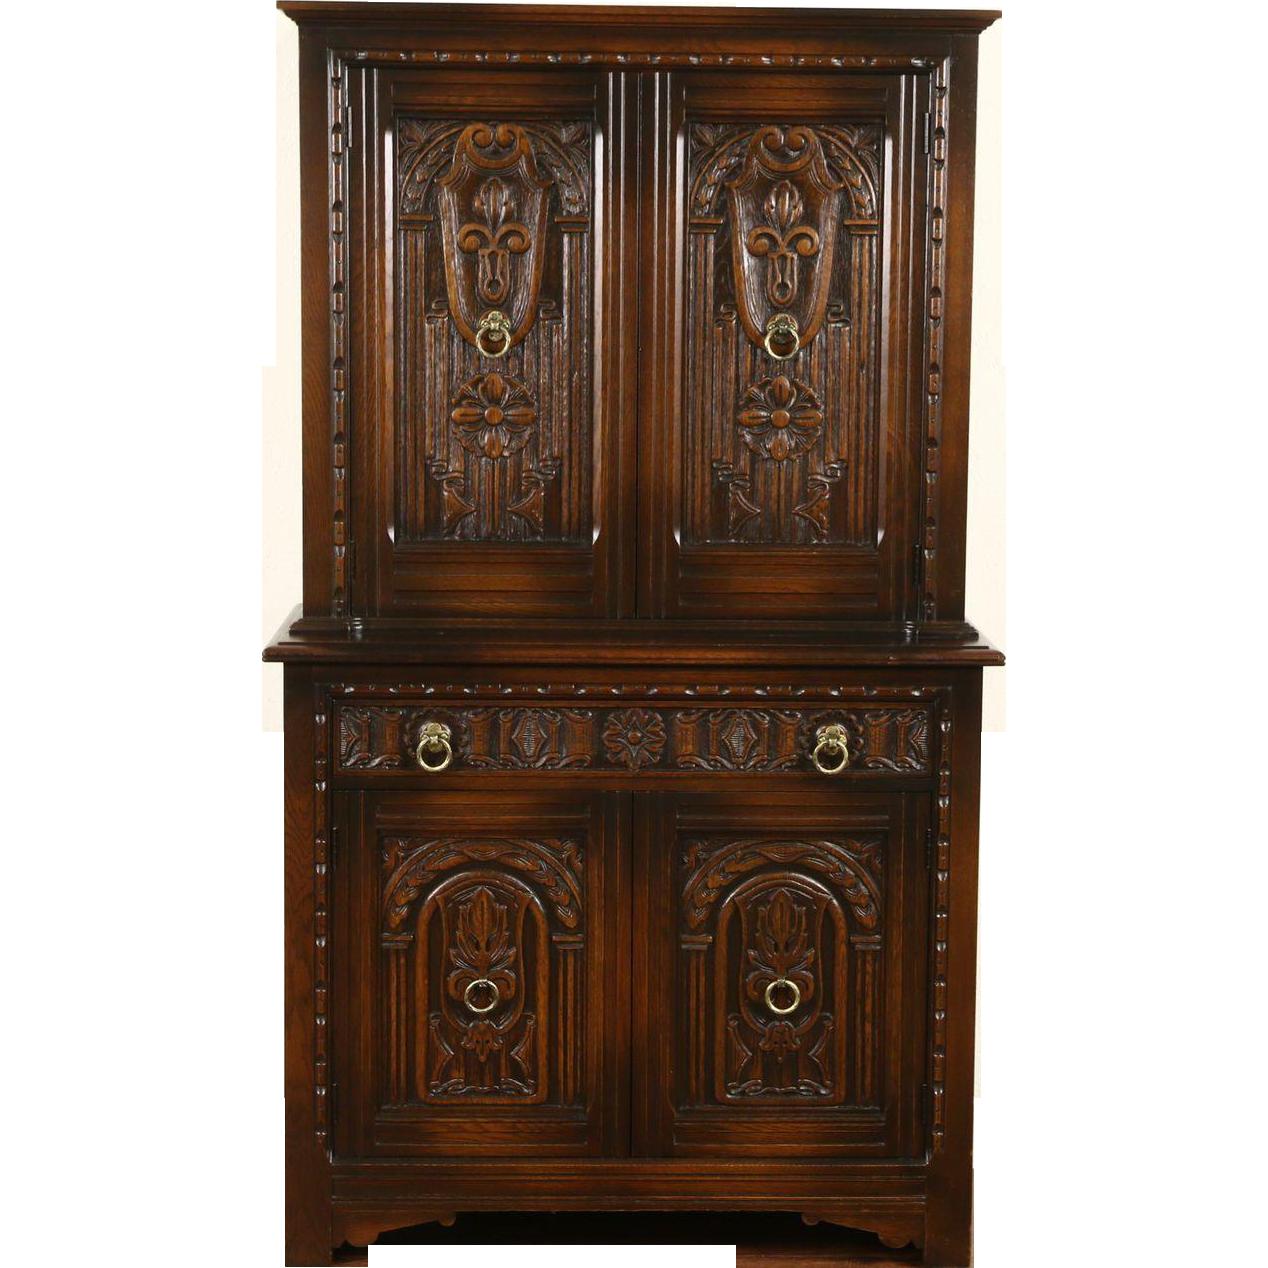 English Tudor 1925 Antique Carved Oak Bar or China Cabinet, Signed Life Time